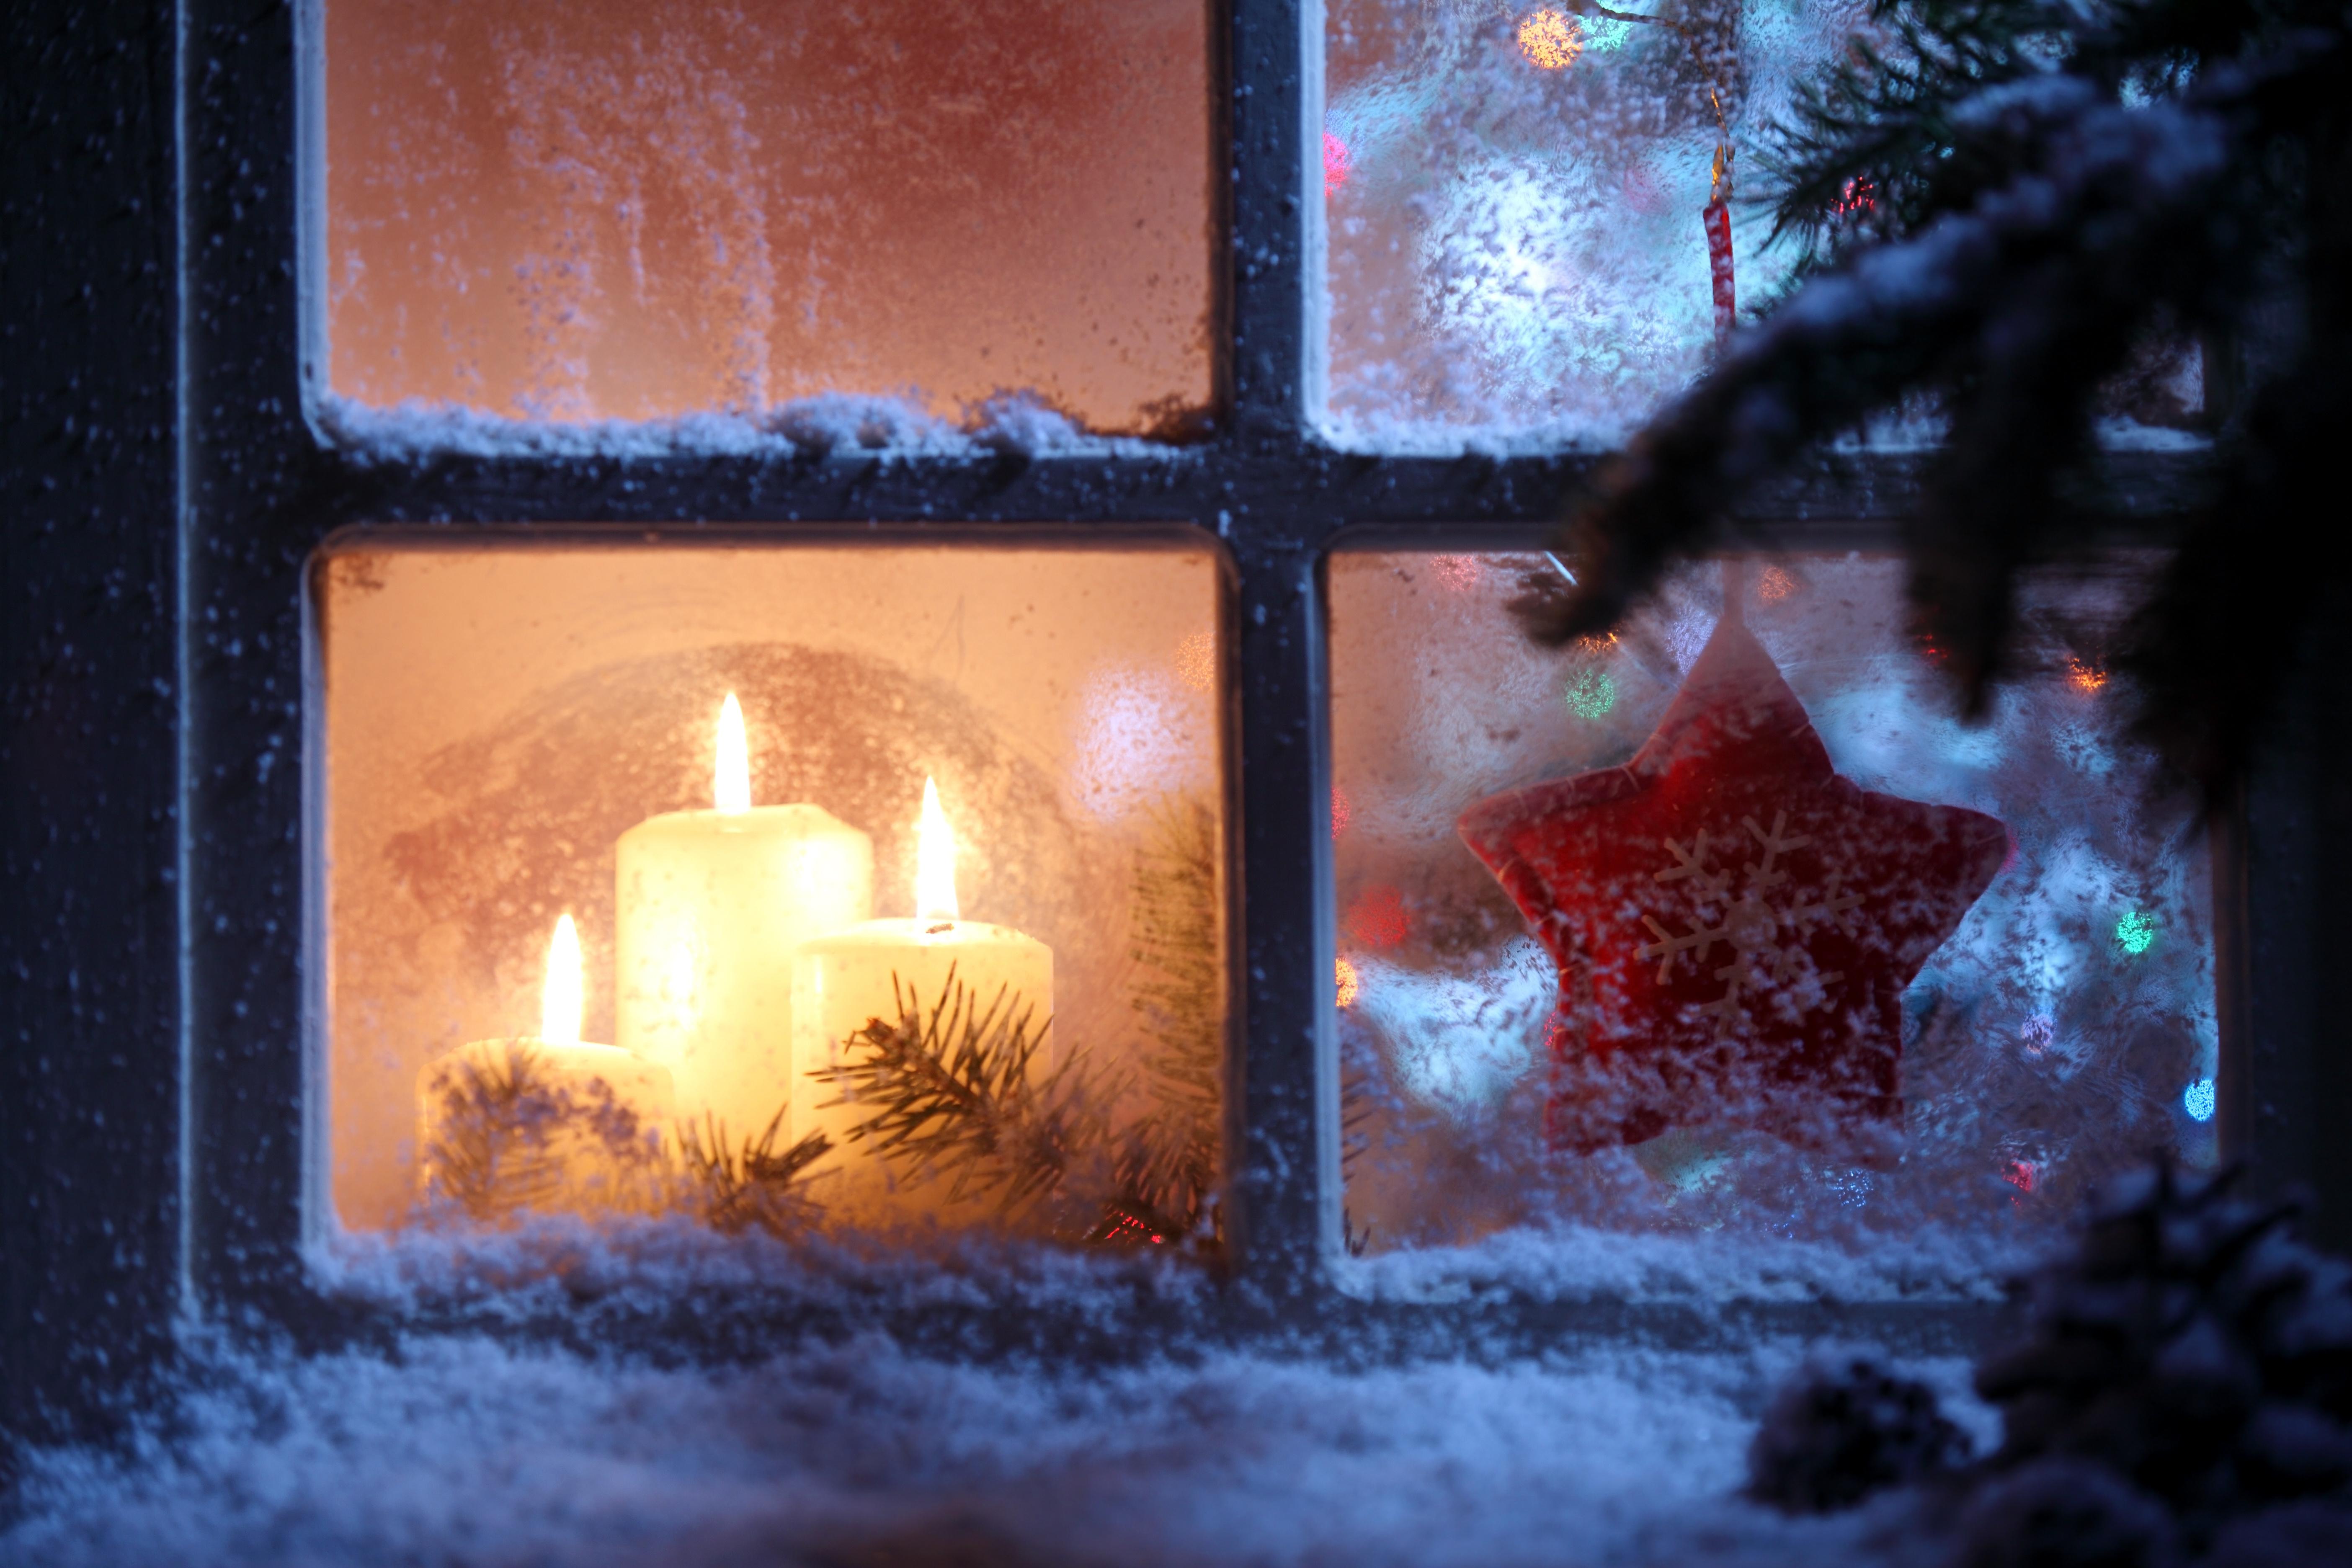 Сапоги новый год окно Boots new year window  № 2639459 без смс